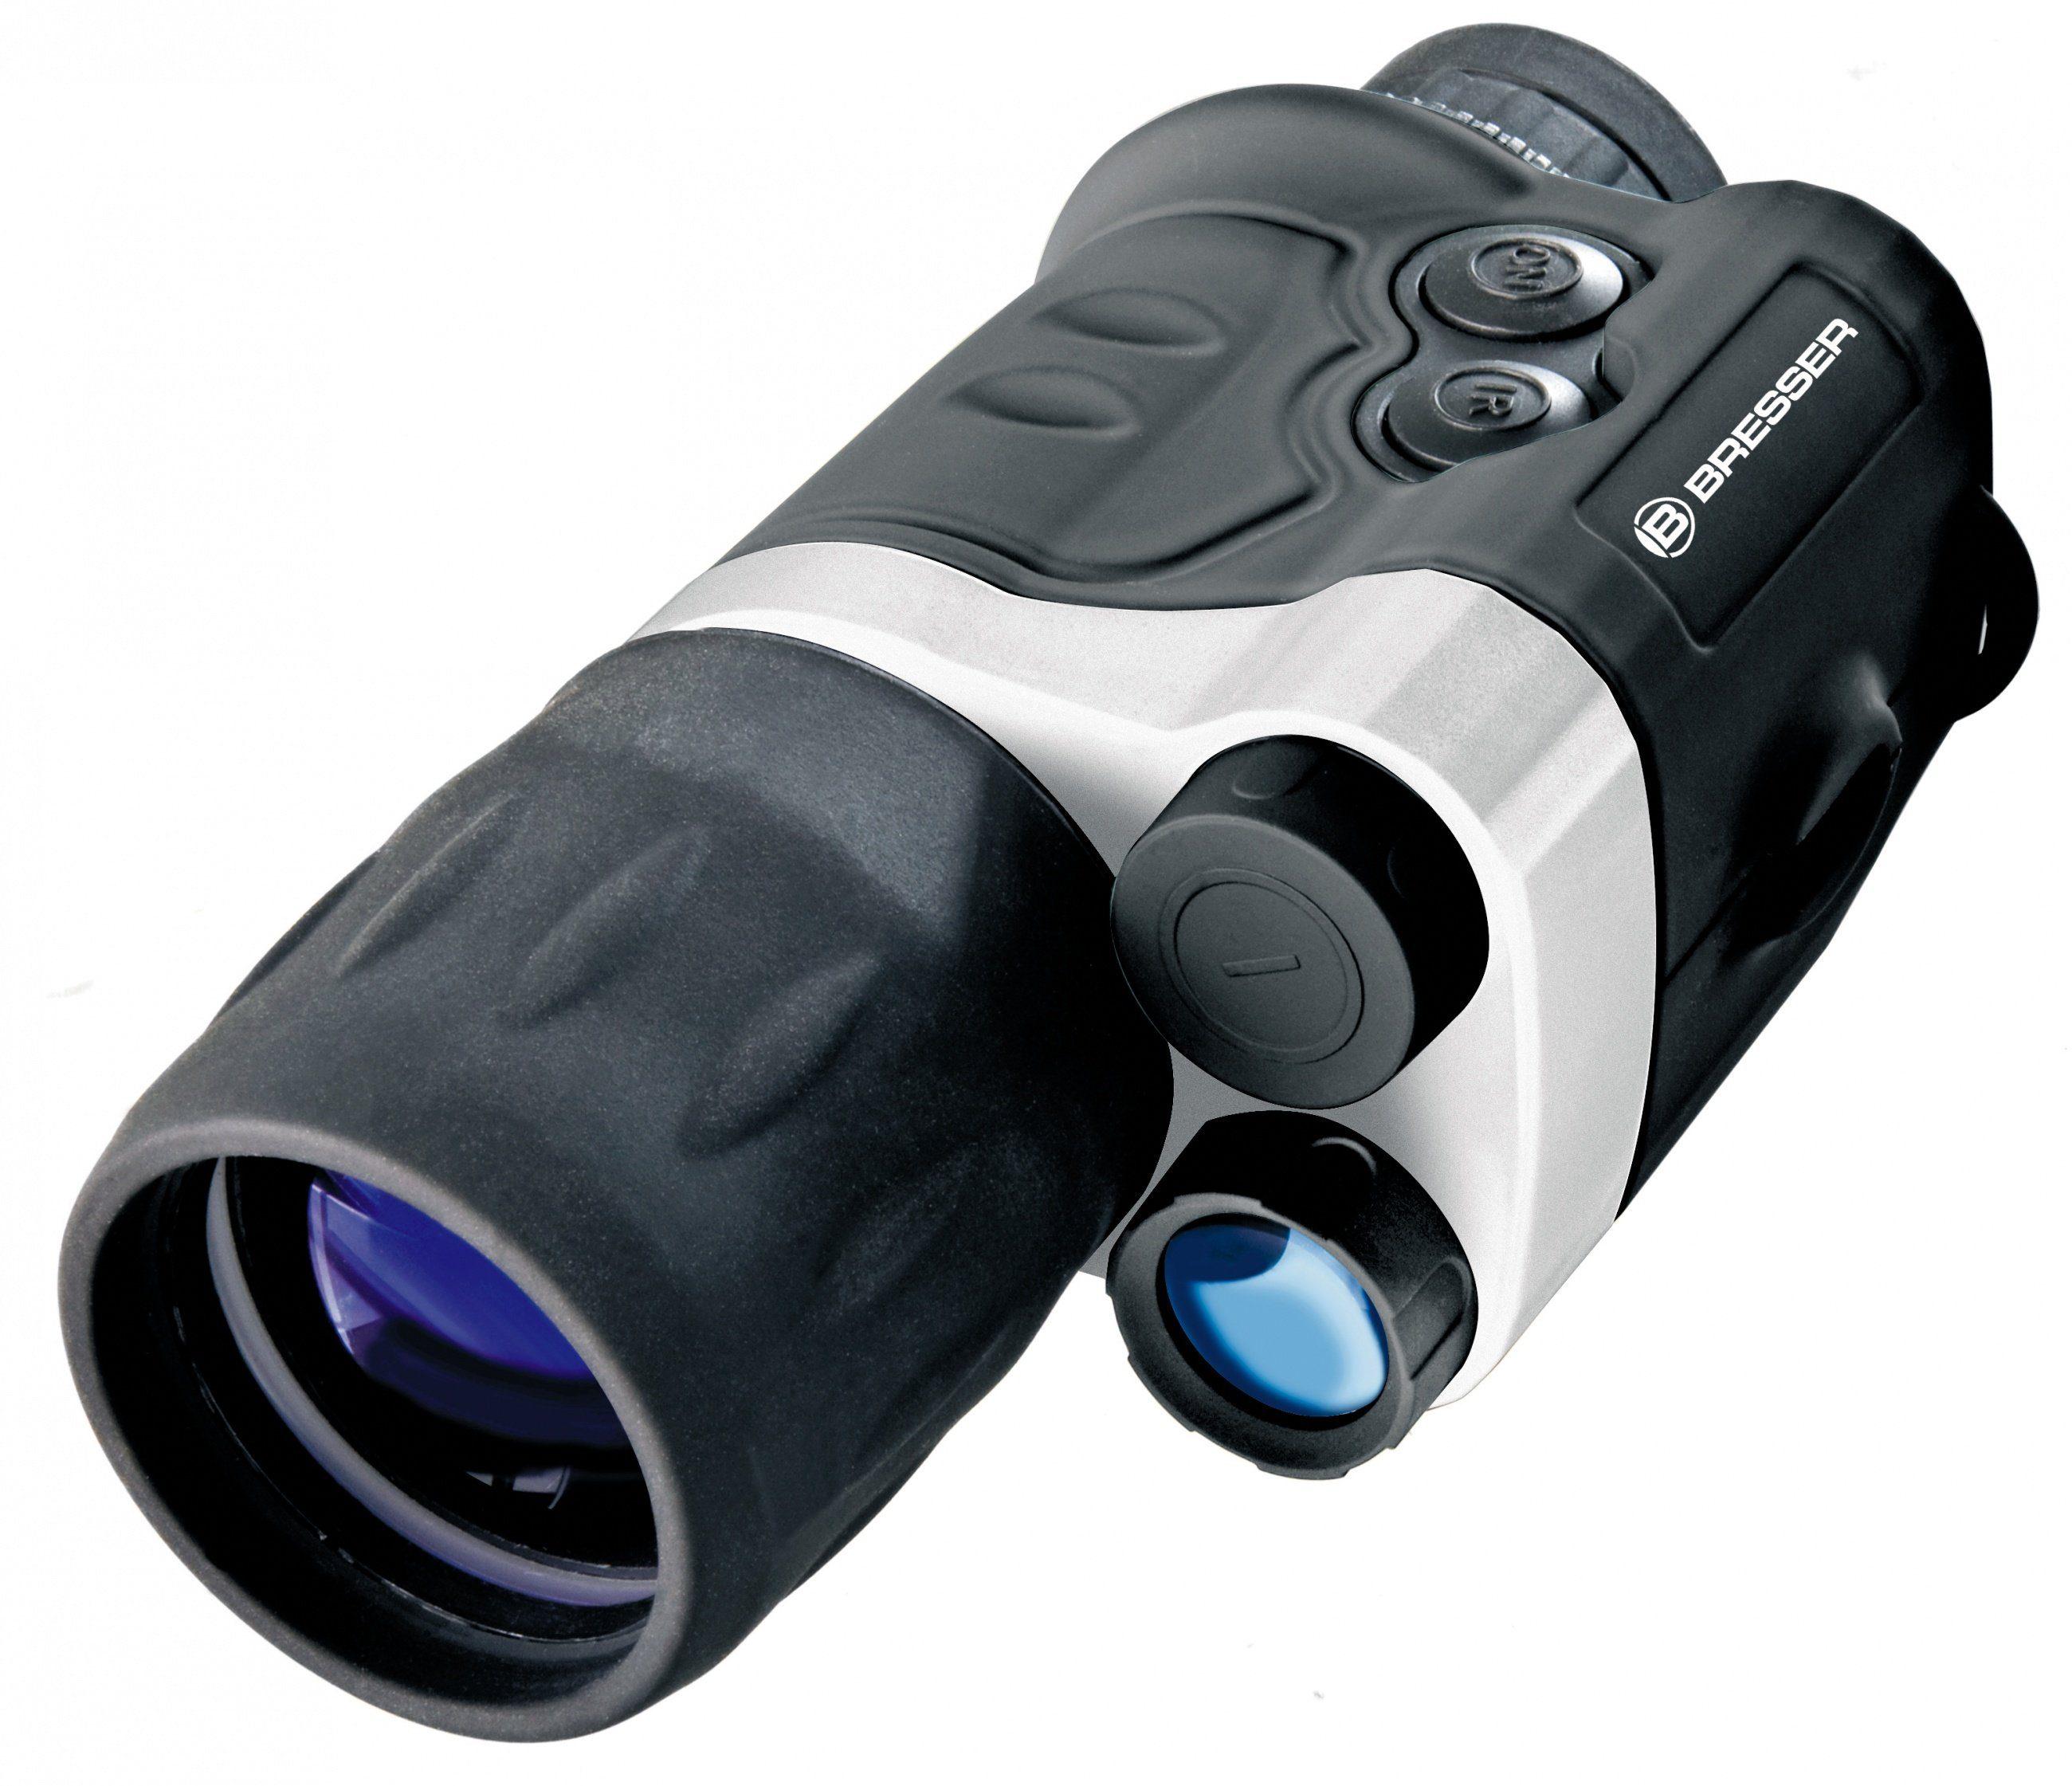 BRESSER Nachtsichtgerät »BRESSER NightSpy 3x42 Nachtsichtgerät«